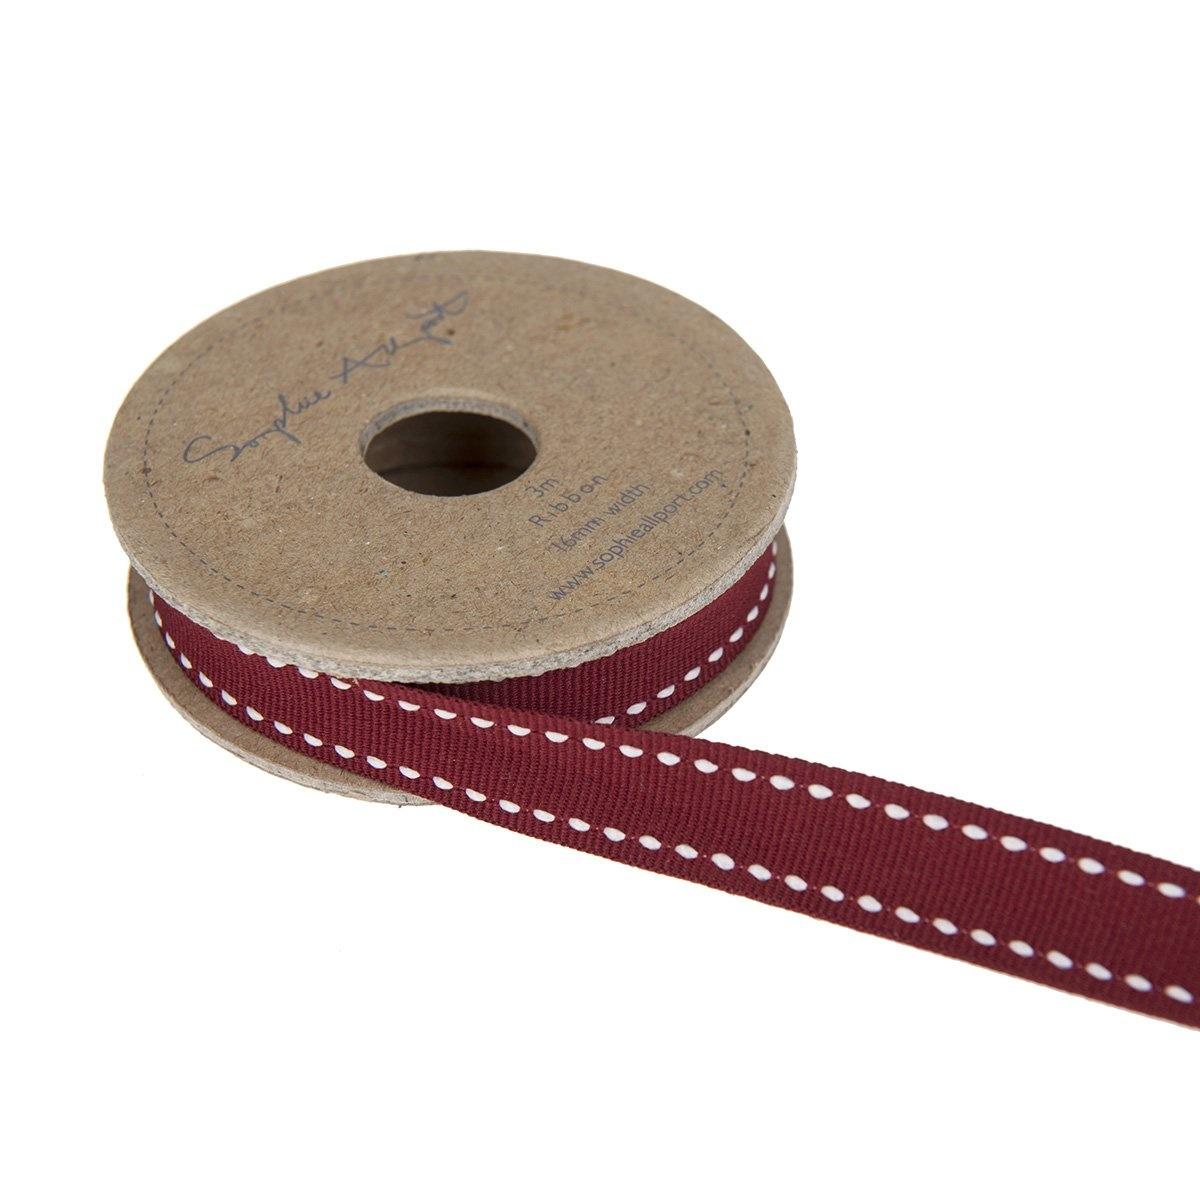 Sophie Allport Ribbon on Spool Red w/ White Stitch